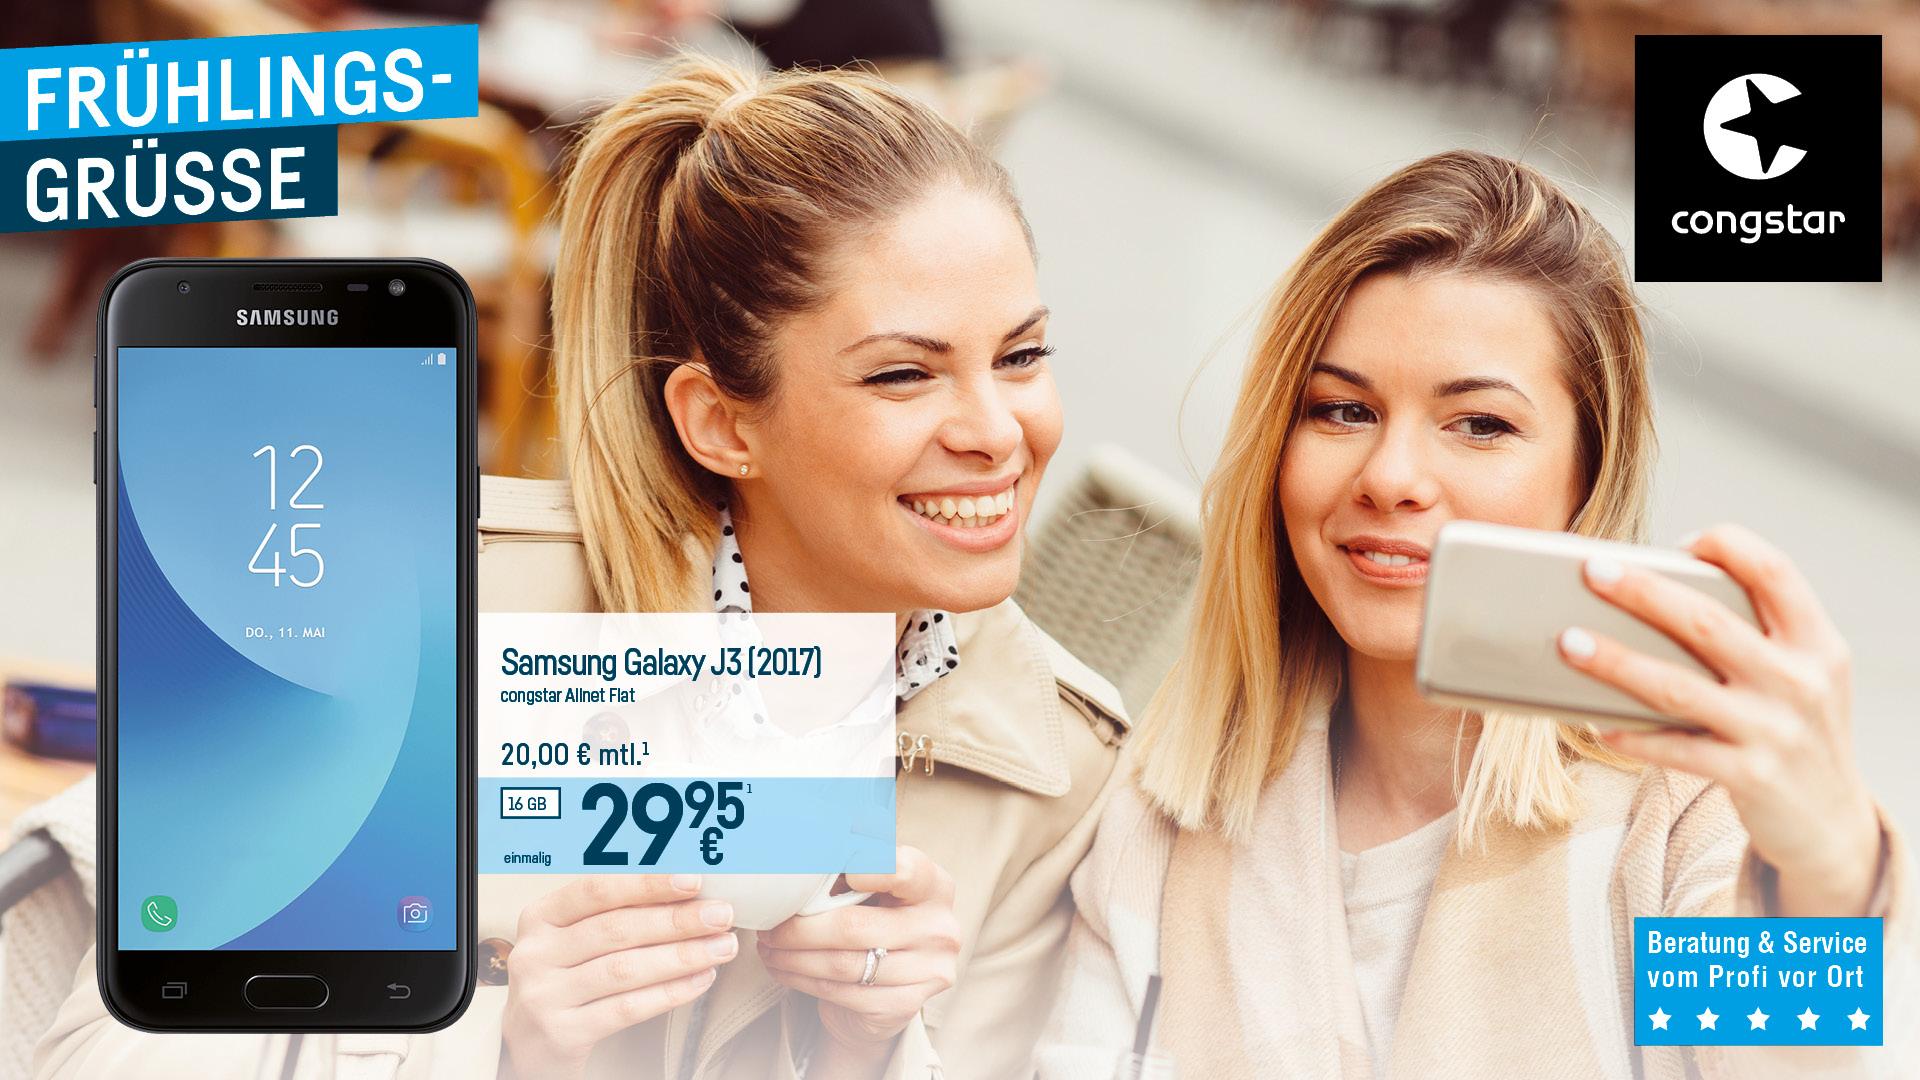 Congstar - Samsung J3 2017 Smartphone